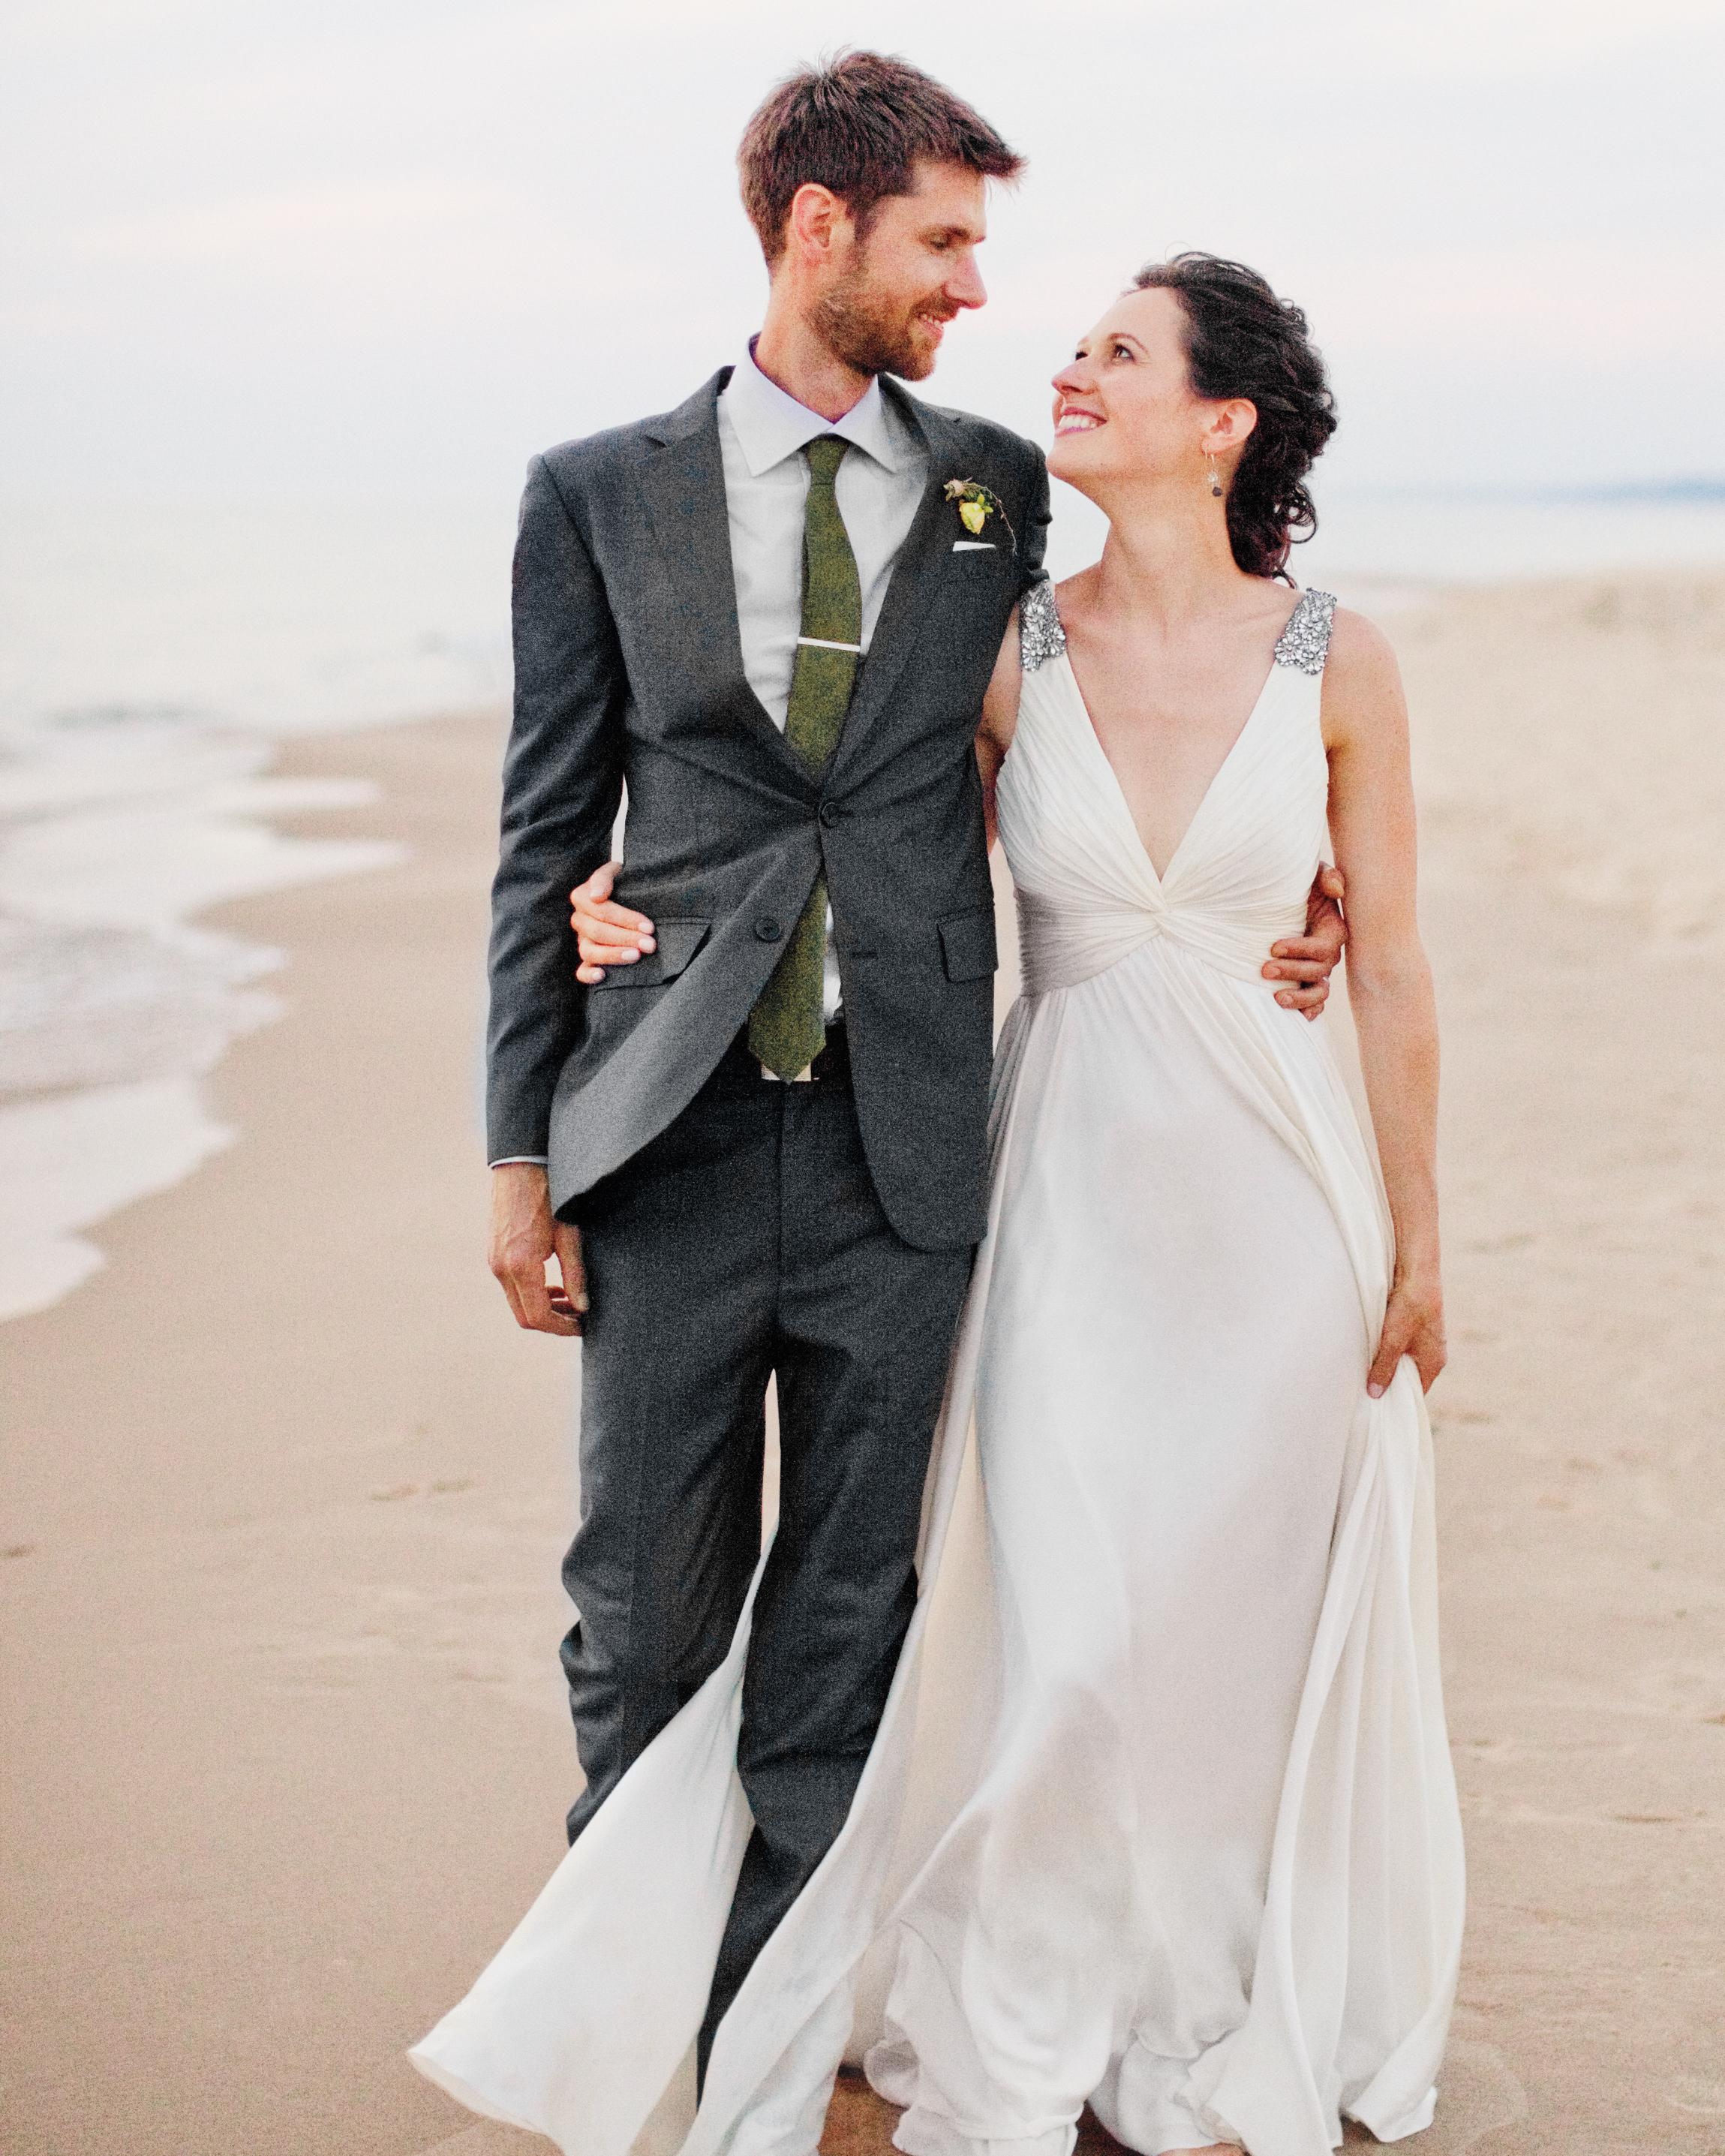 anne-shane-couple-635-mwds110279.jpg